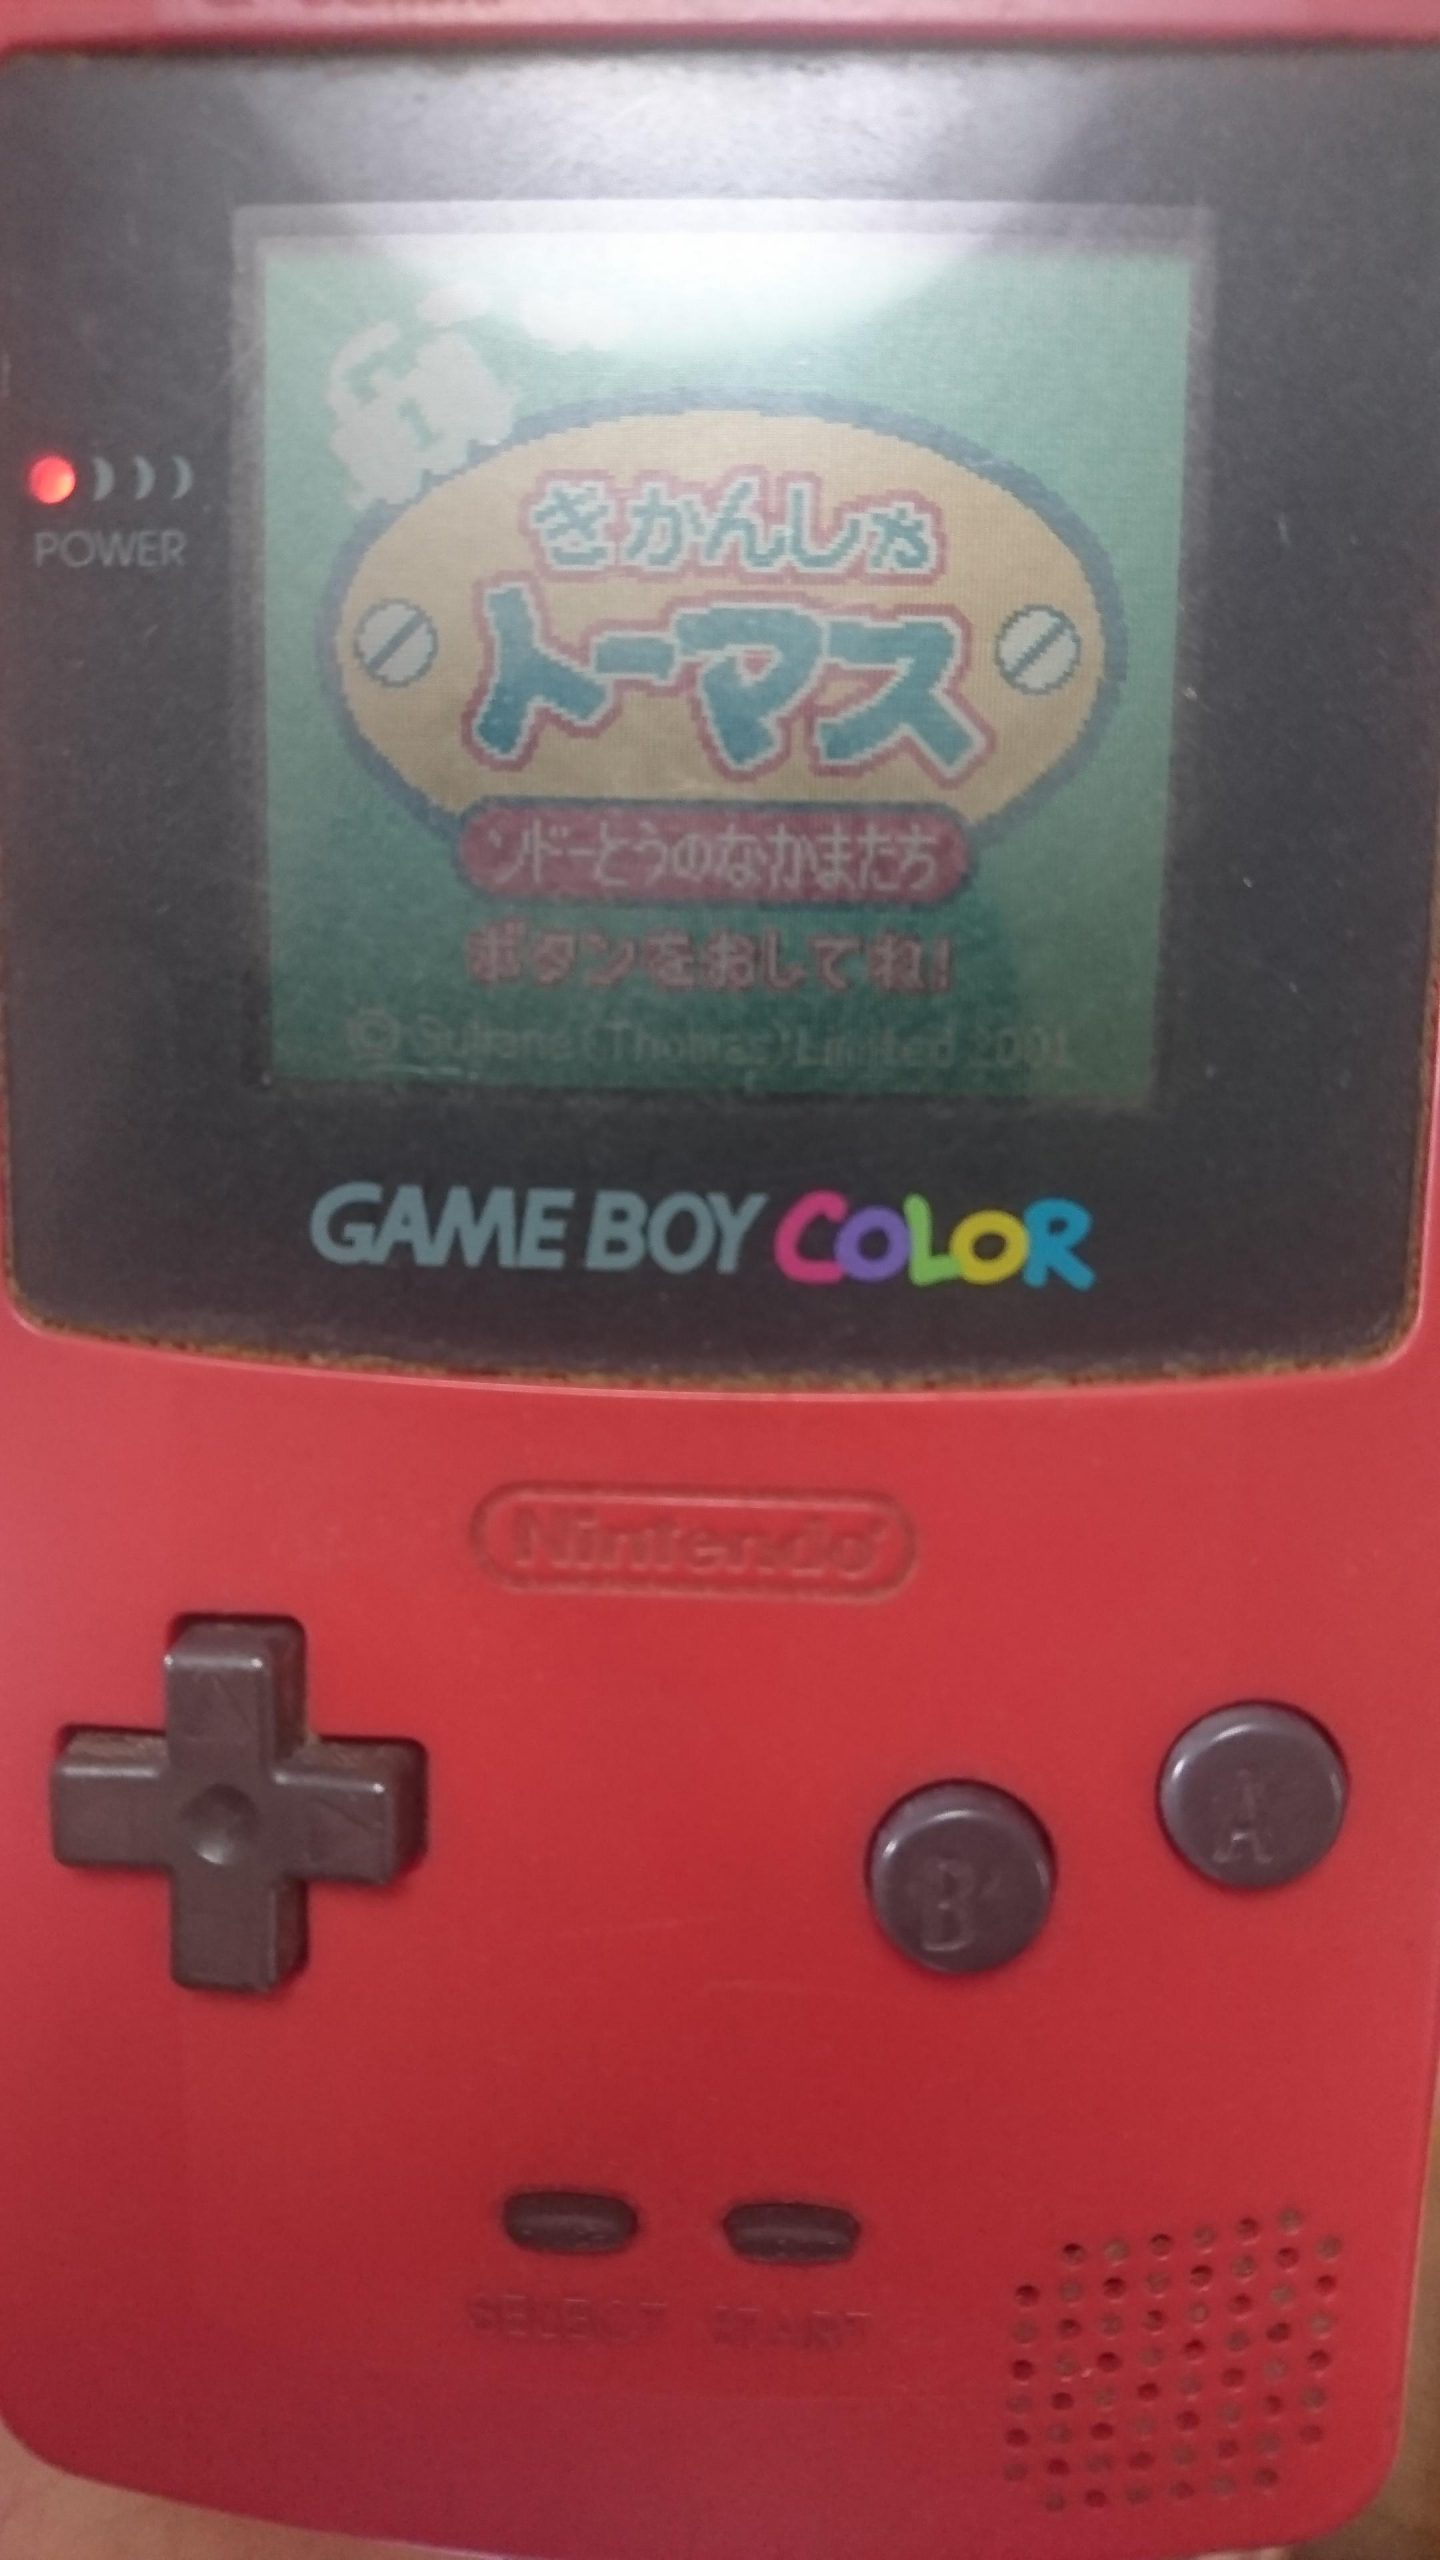 rjdOv8T scaled - 【速報】ゲームボーイ本日発売 12,500円(税込)